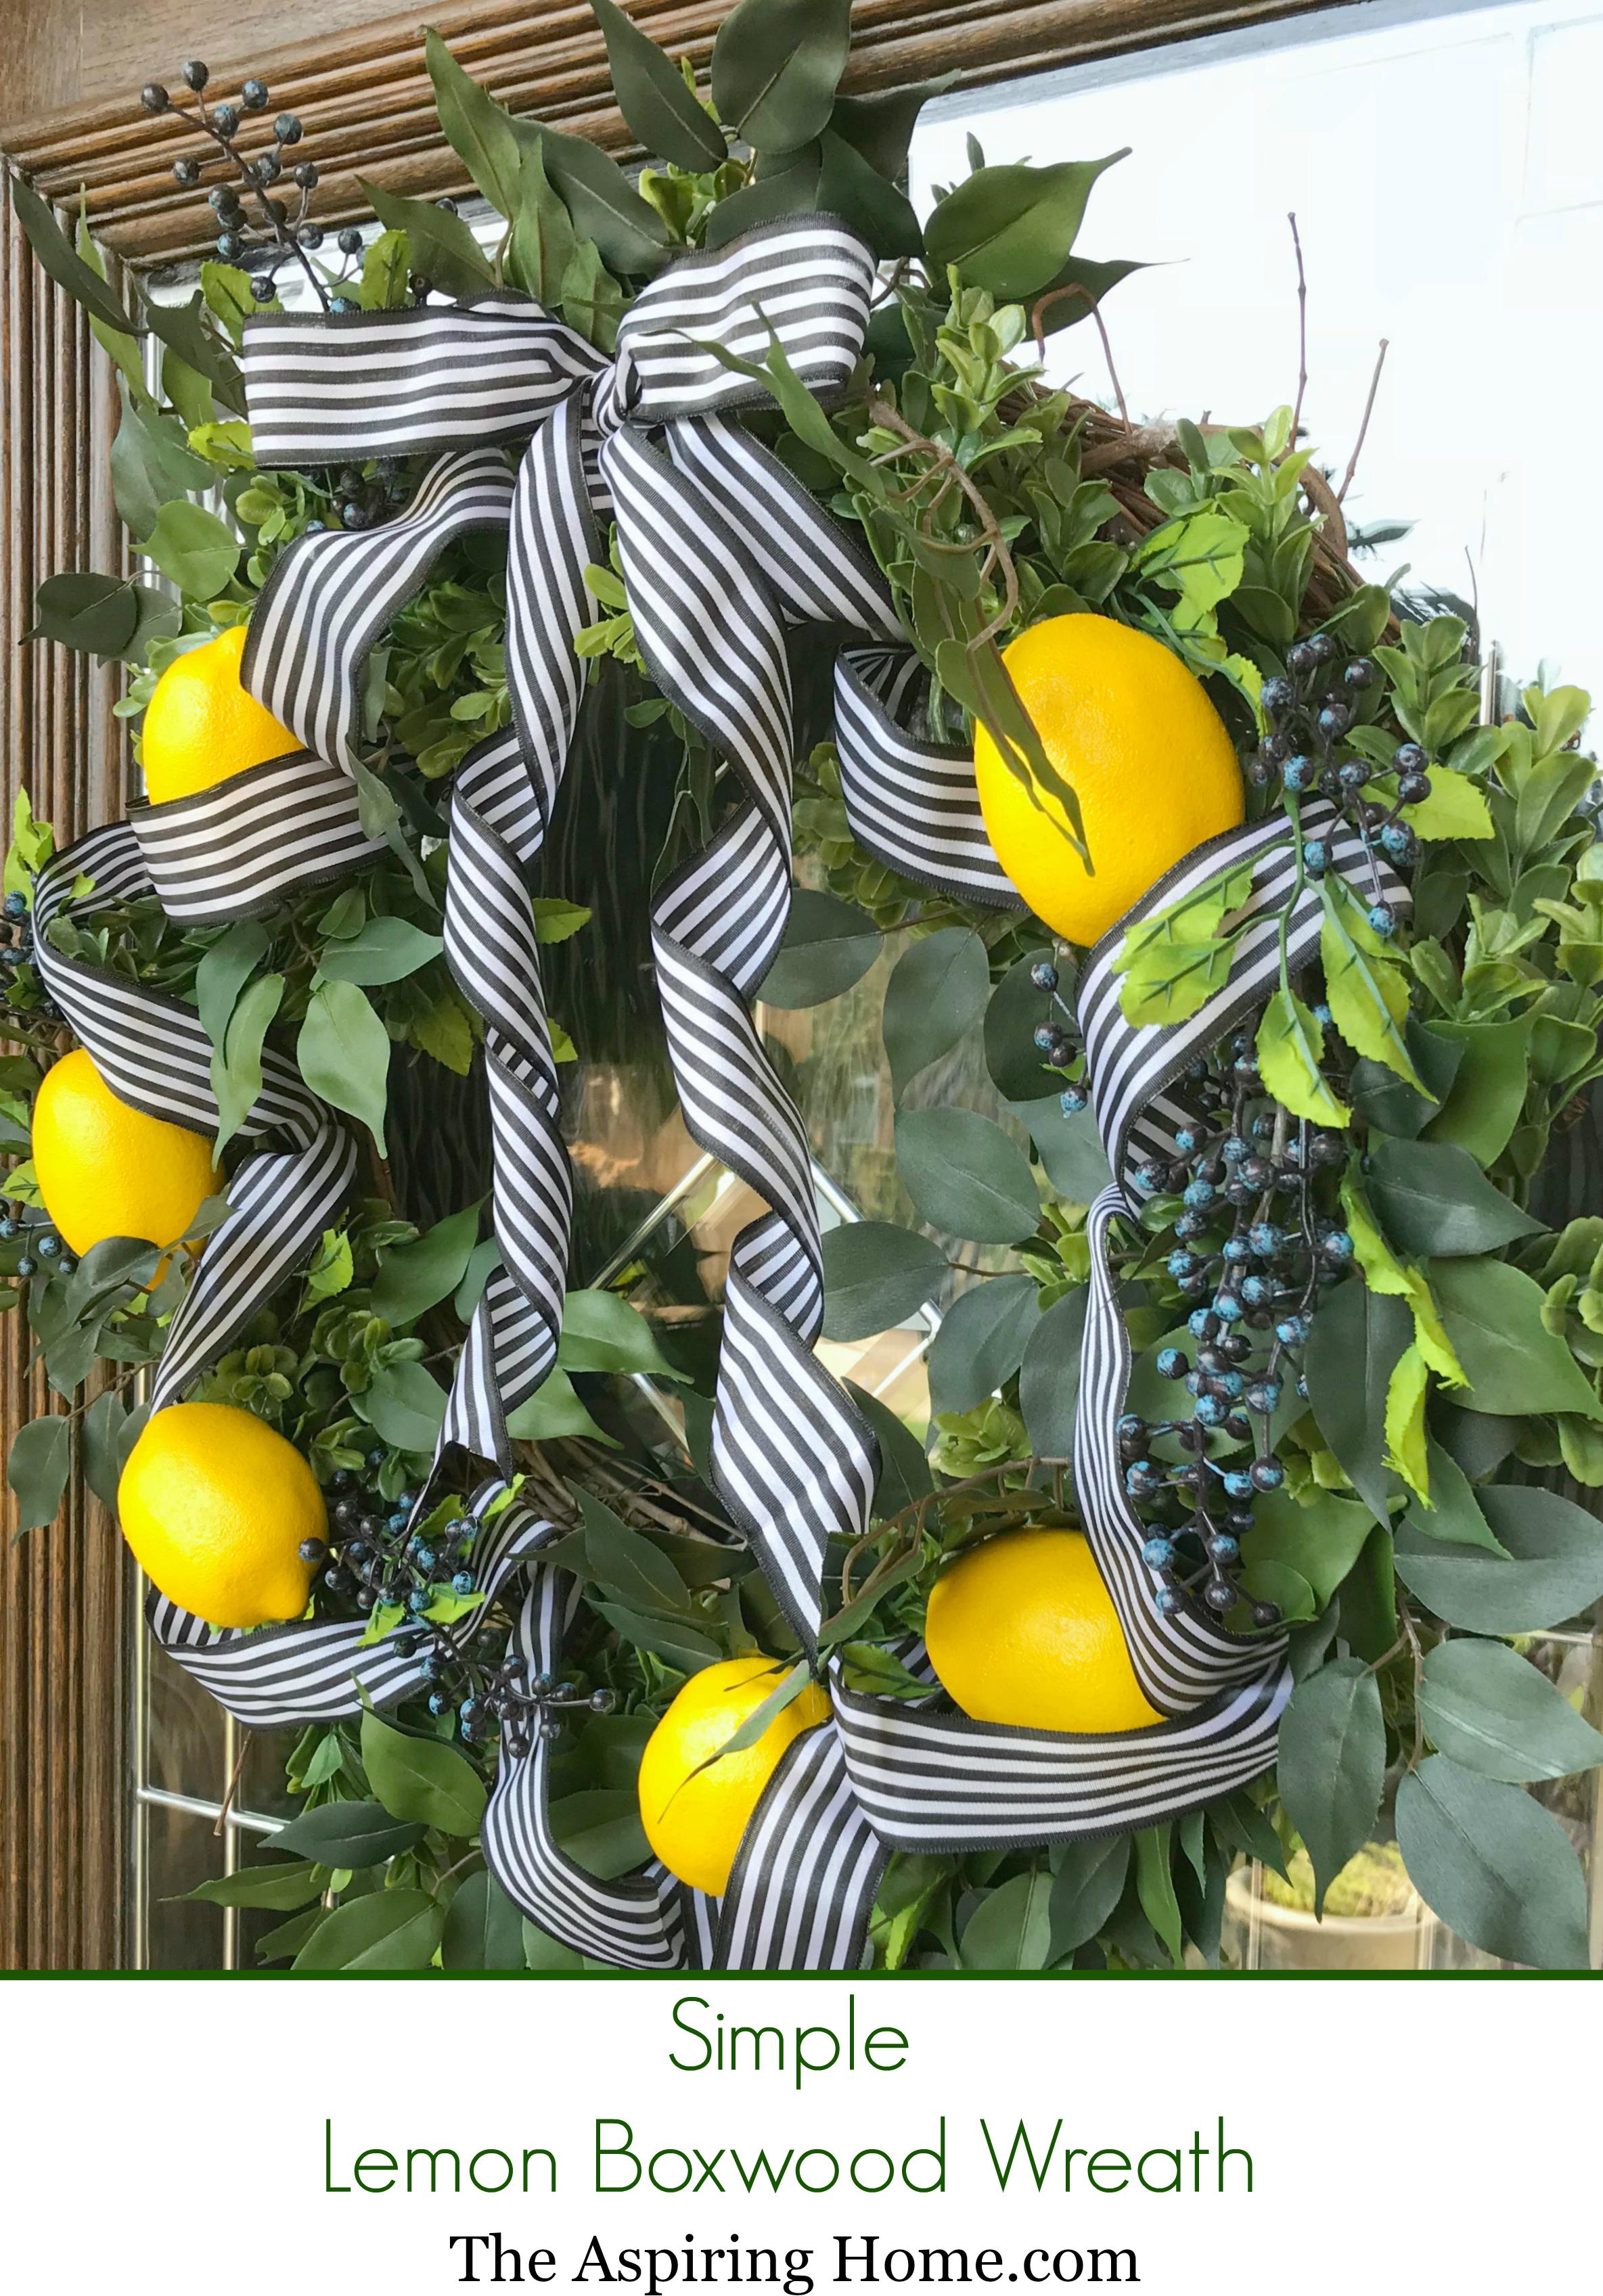 Simple Lemon Boxwood Wreath